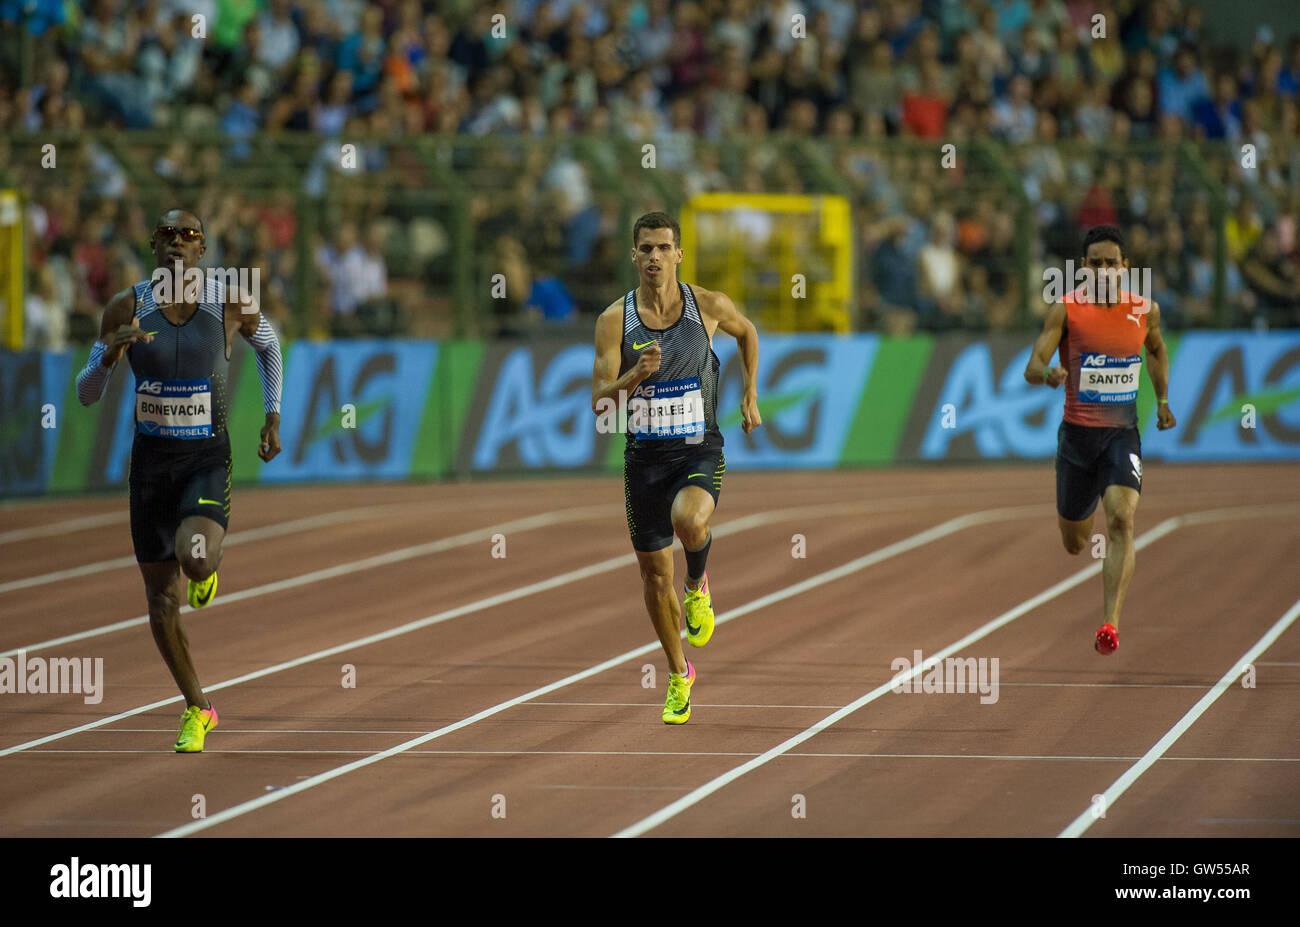 BRUSSELS, BELGIUM - SEPTEMBER 9: Liemarvin Bonevacia _ Jonathan Borlee _ Luguelin Santos competing in the Men's - Stock Image